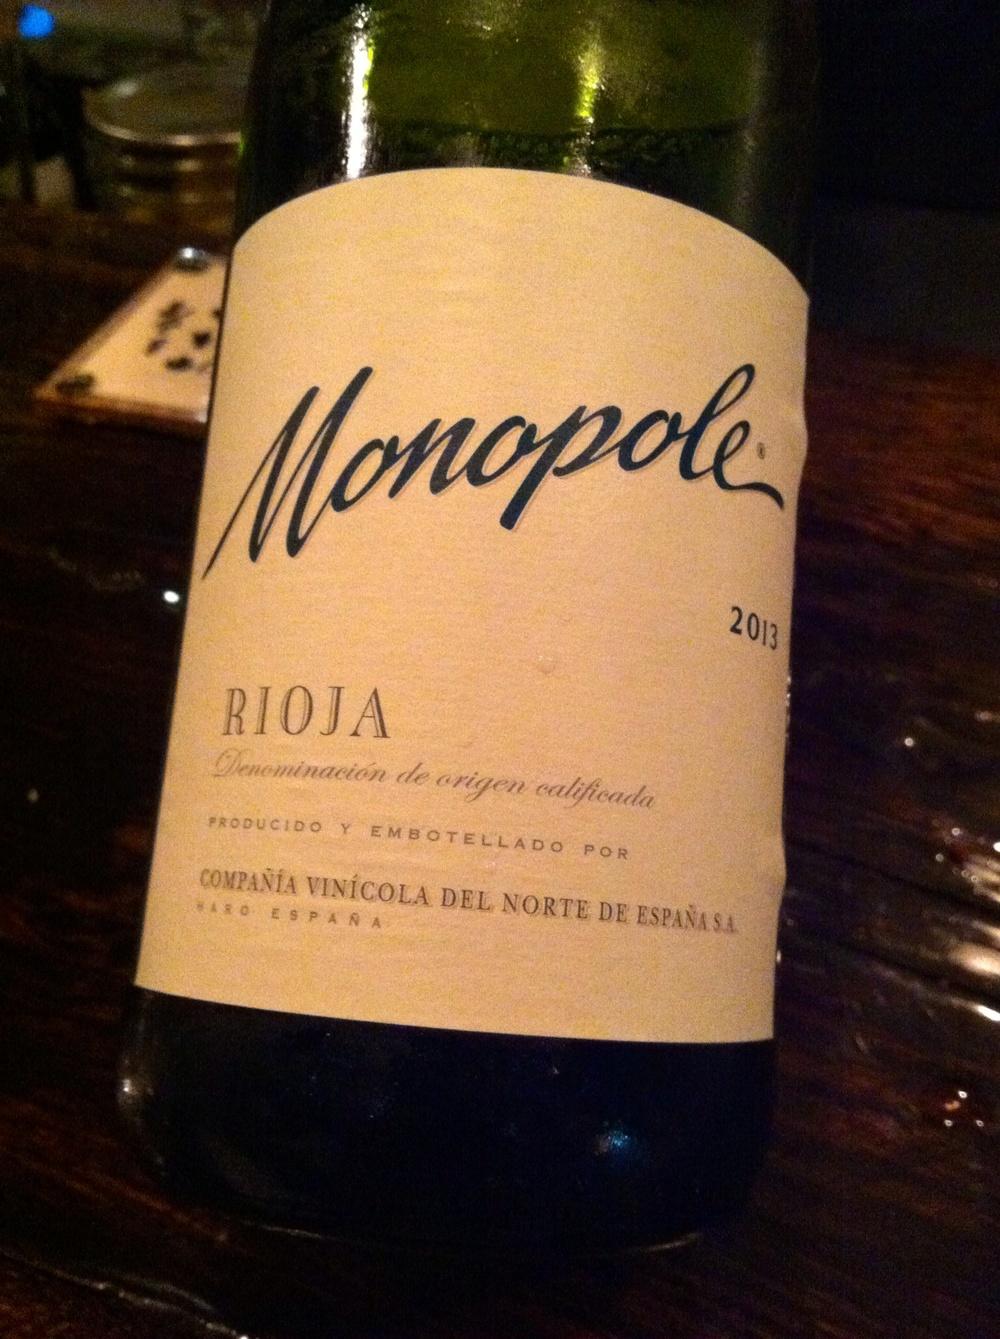 Monopole Rioja Blanca, Spain, 2013. Photo by Shana Sokol, Shana Speaks Wine.